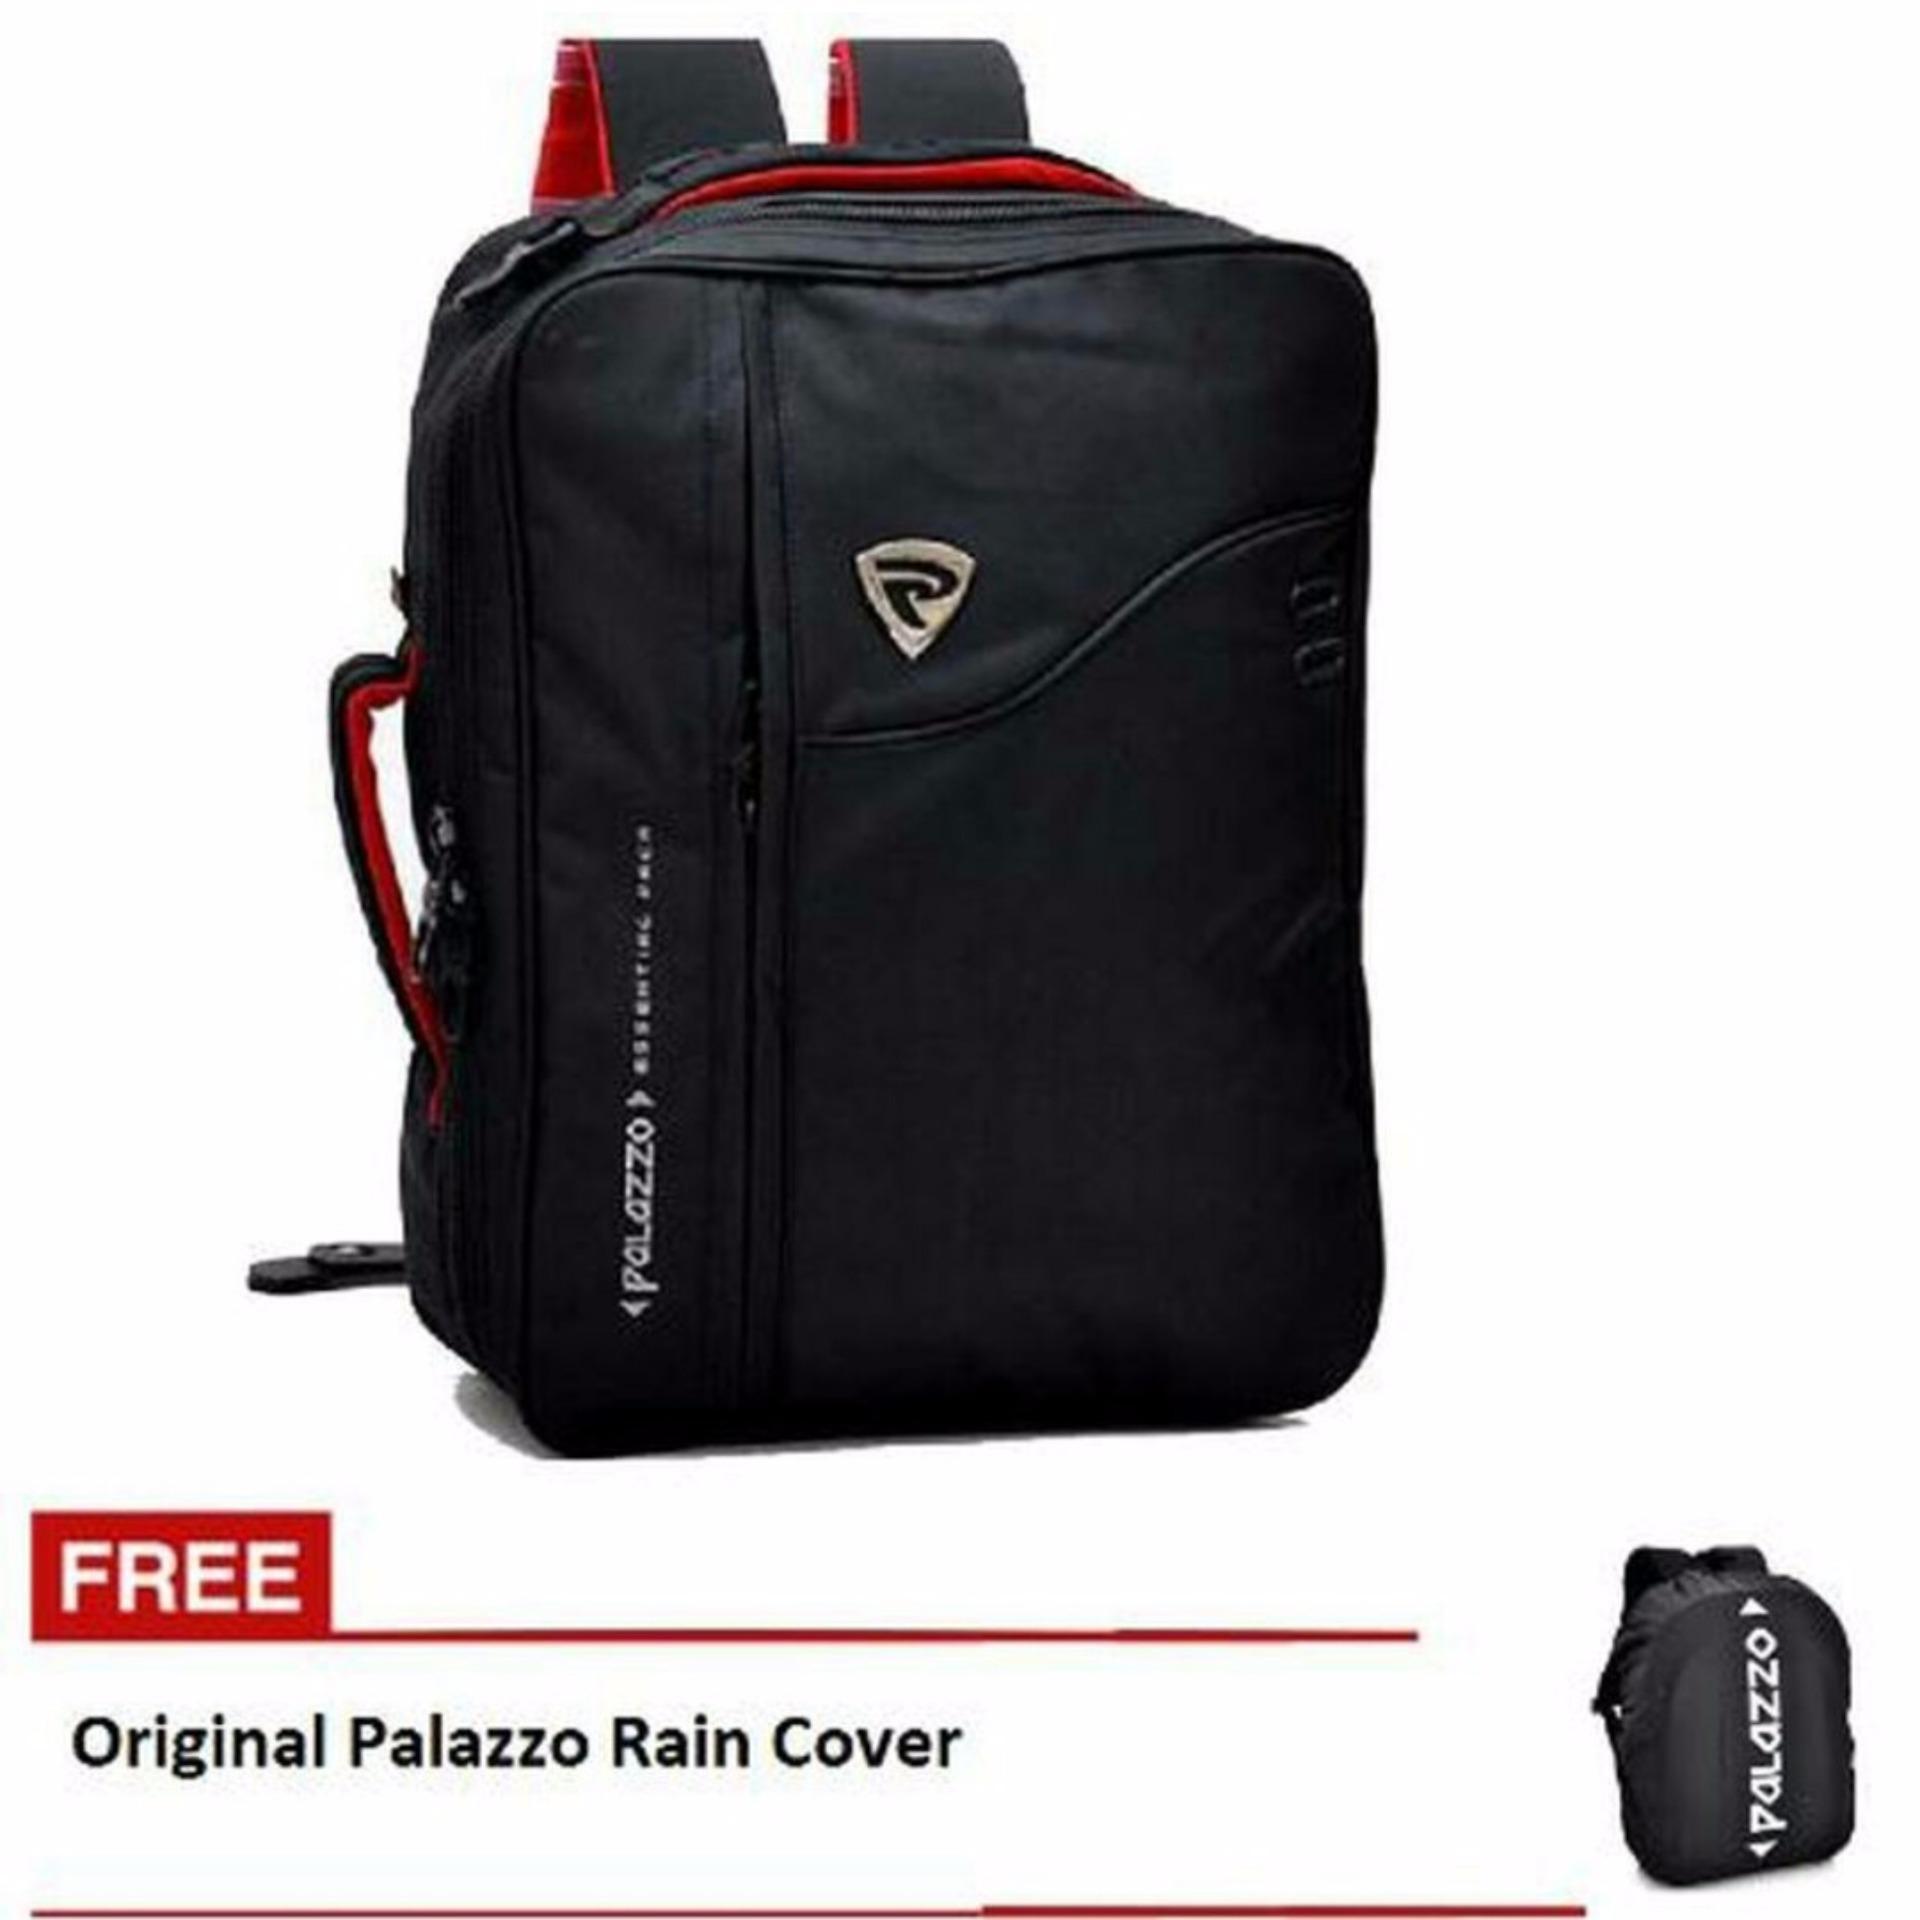 Harga Palazzo Tas Ransel 3In1 Ransel Slempang Jinjing 34685 Free Rain Cover Hitam Yg Bagus